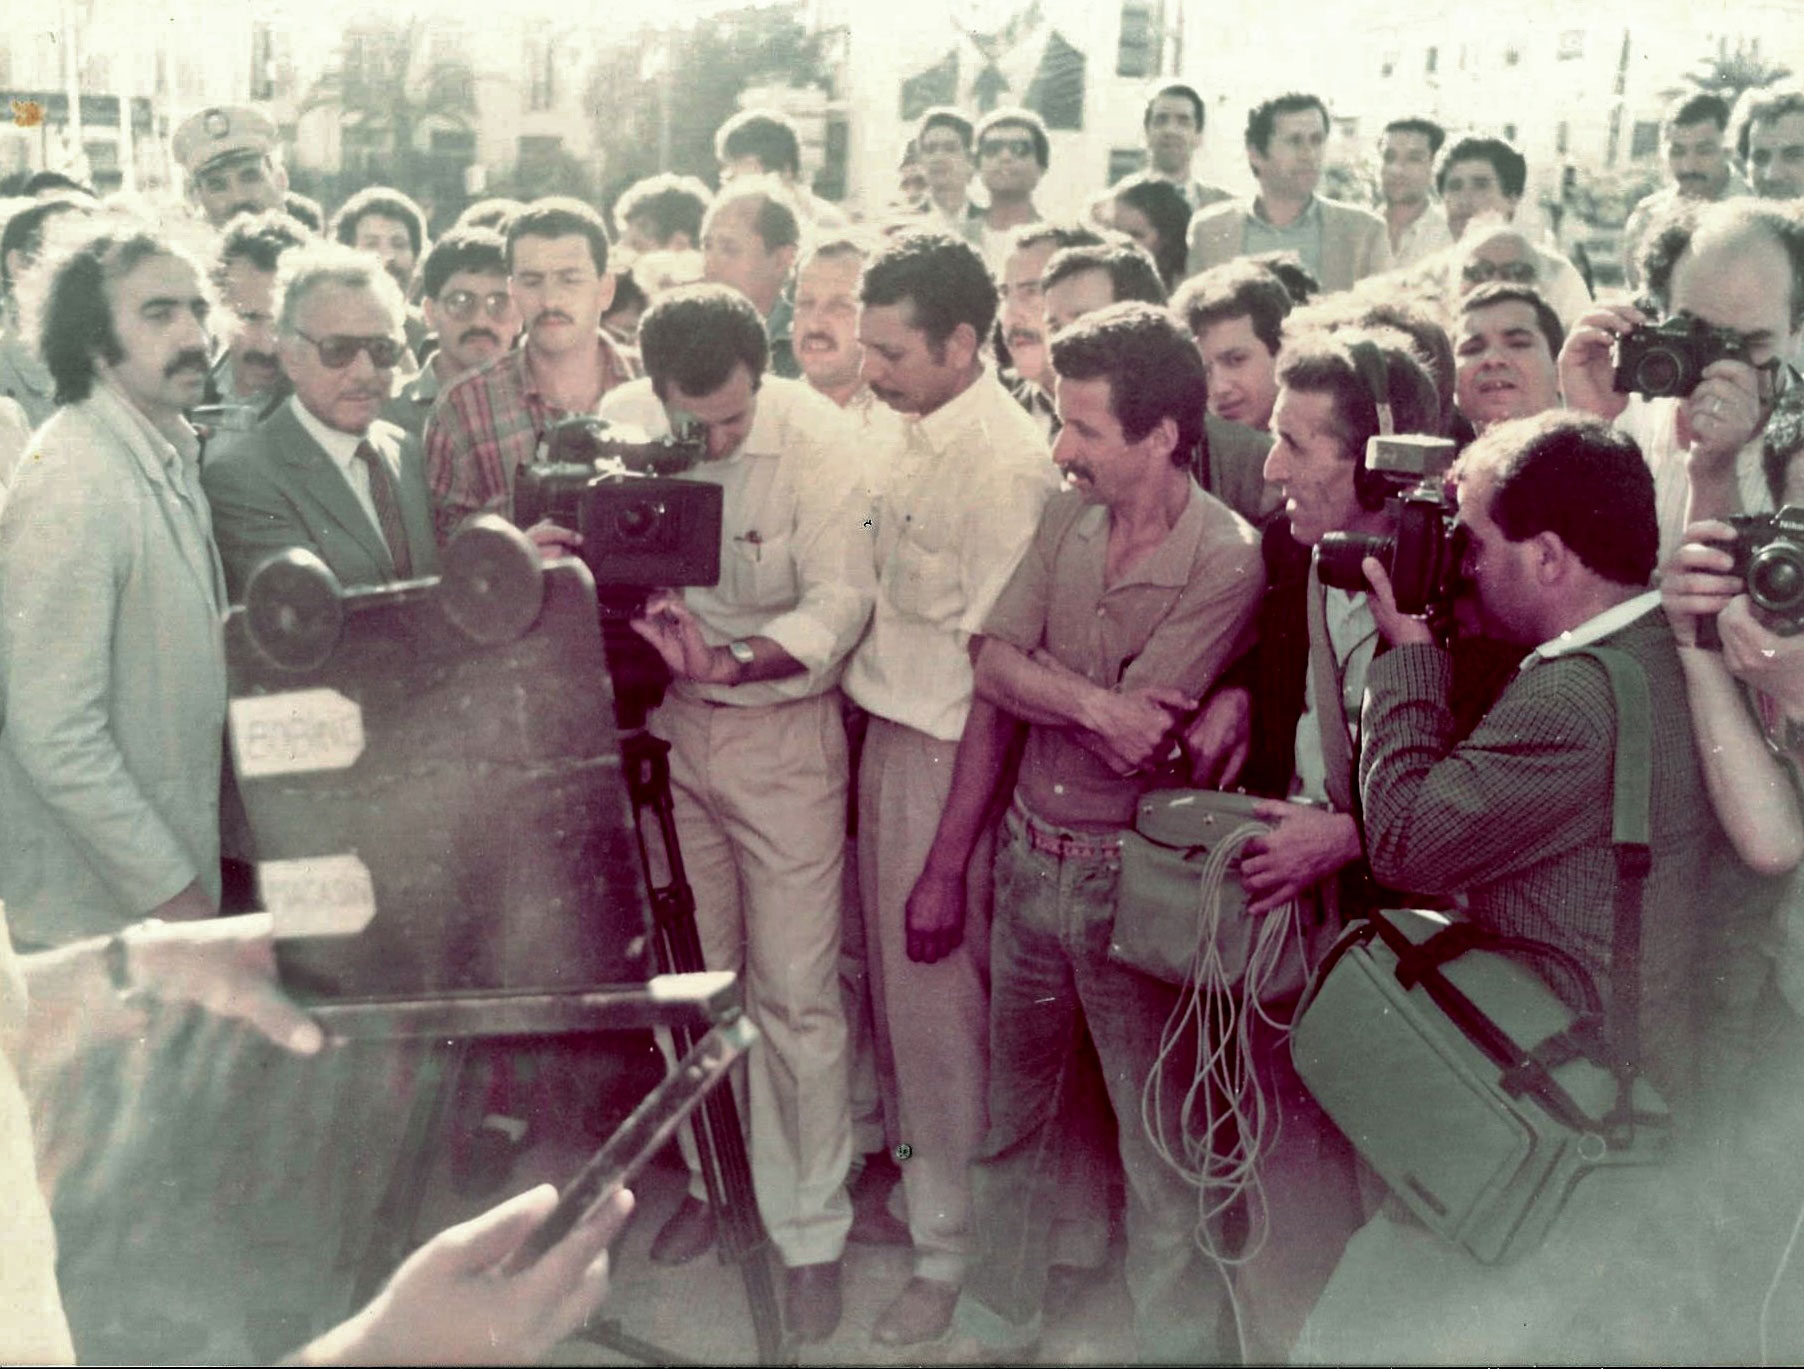 1er-Tour-Manivelle-Annaba,-JP-Lledo,-Ministre-Culture-Bessaiah--3-Juin--1988-LUMIERES-1